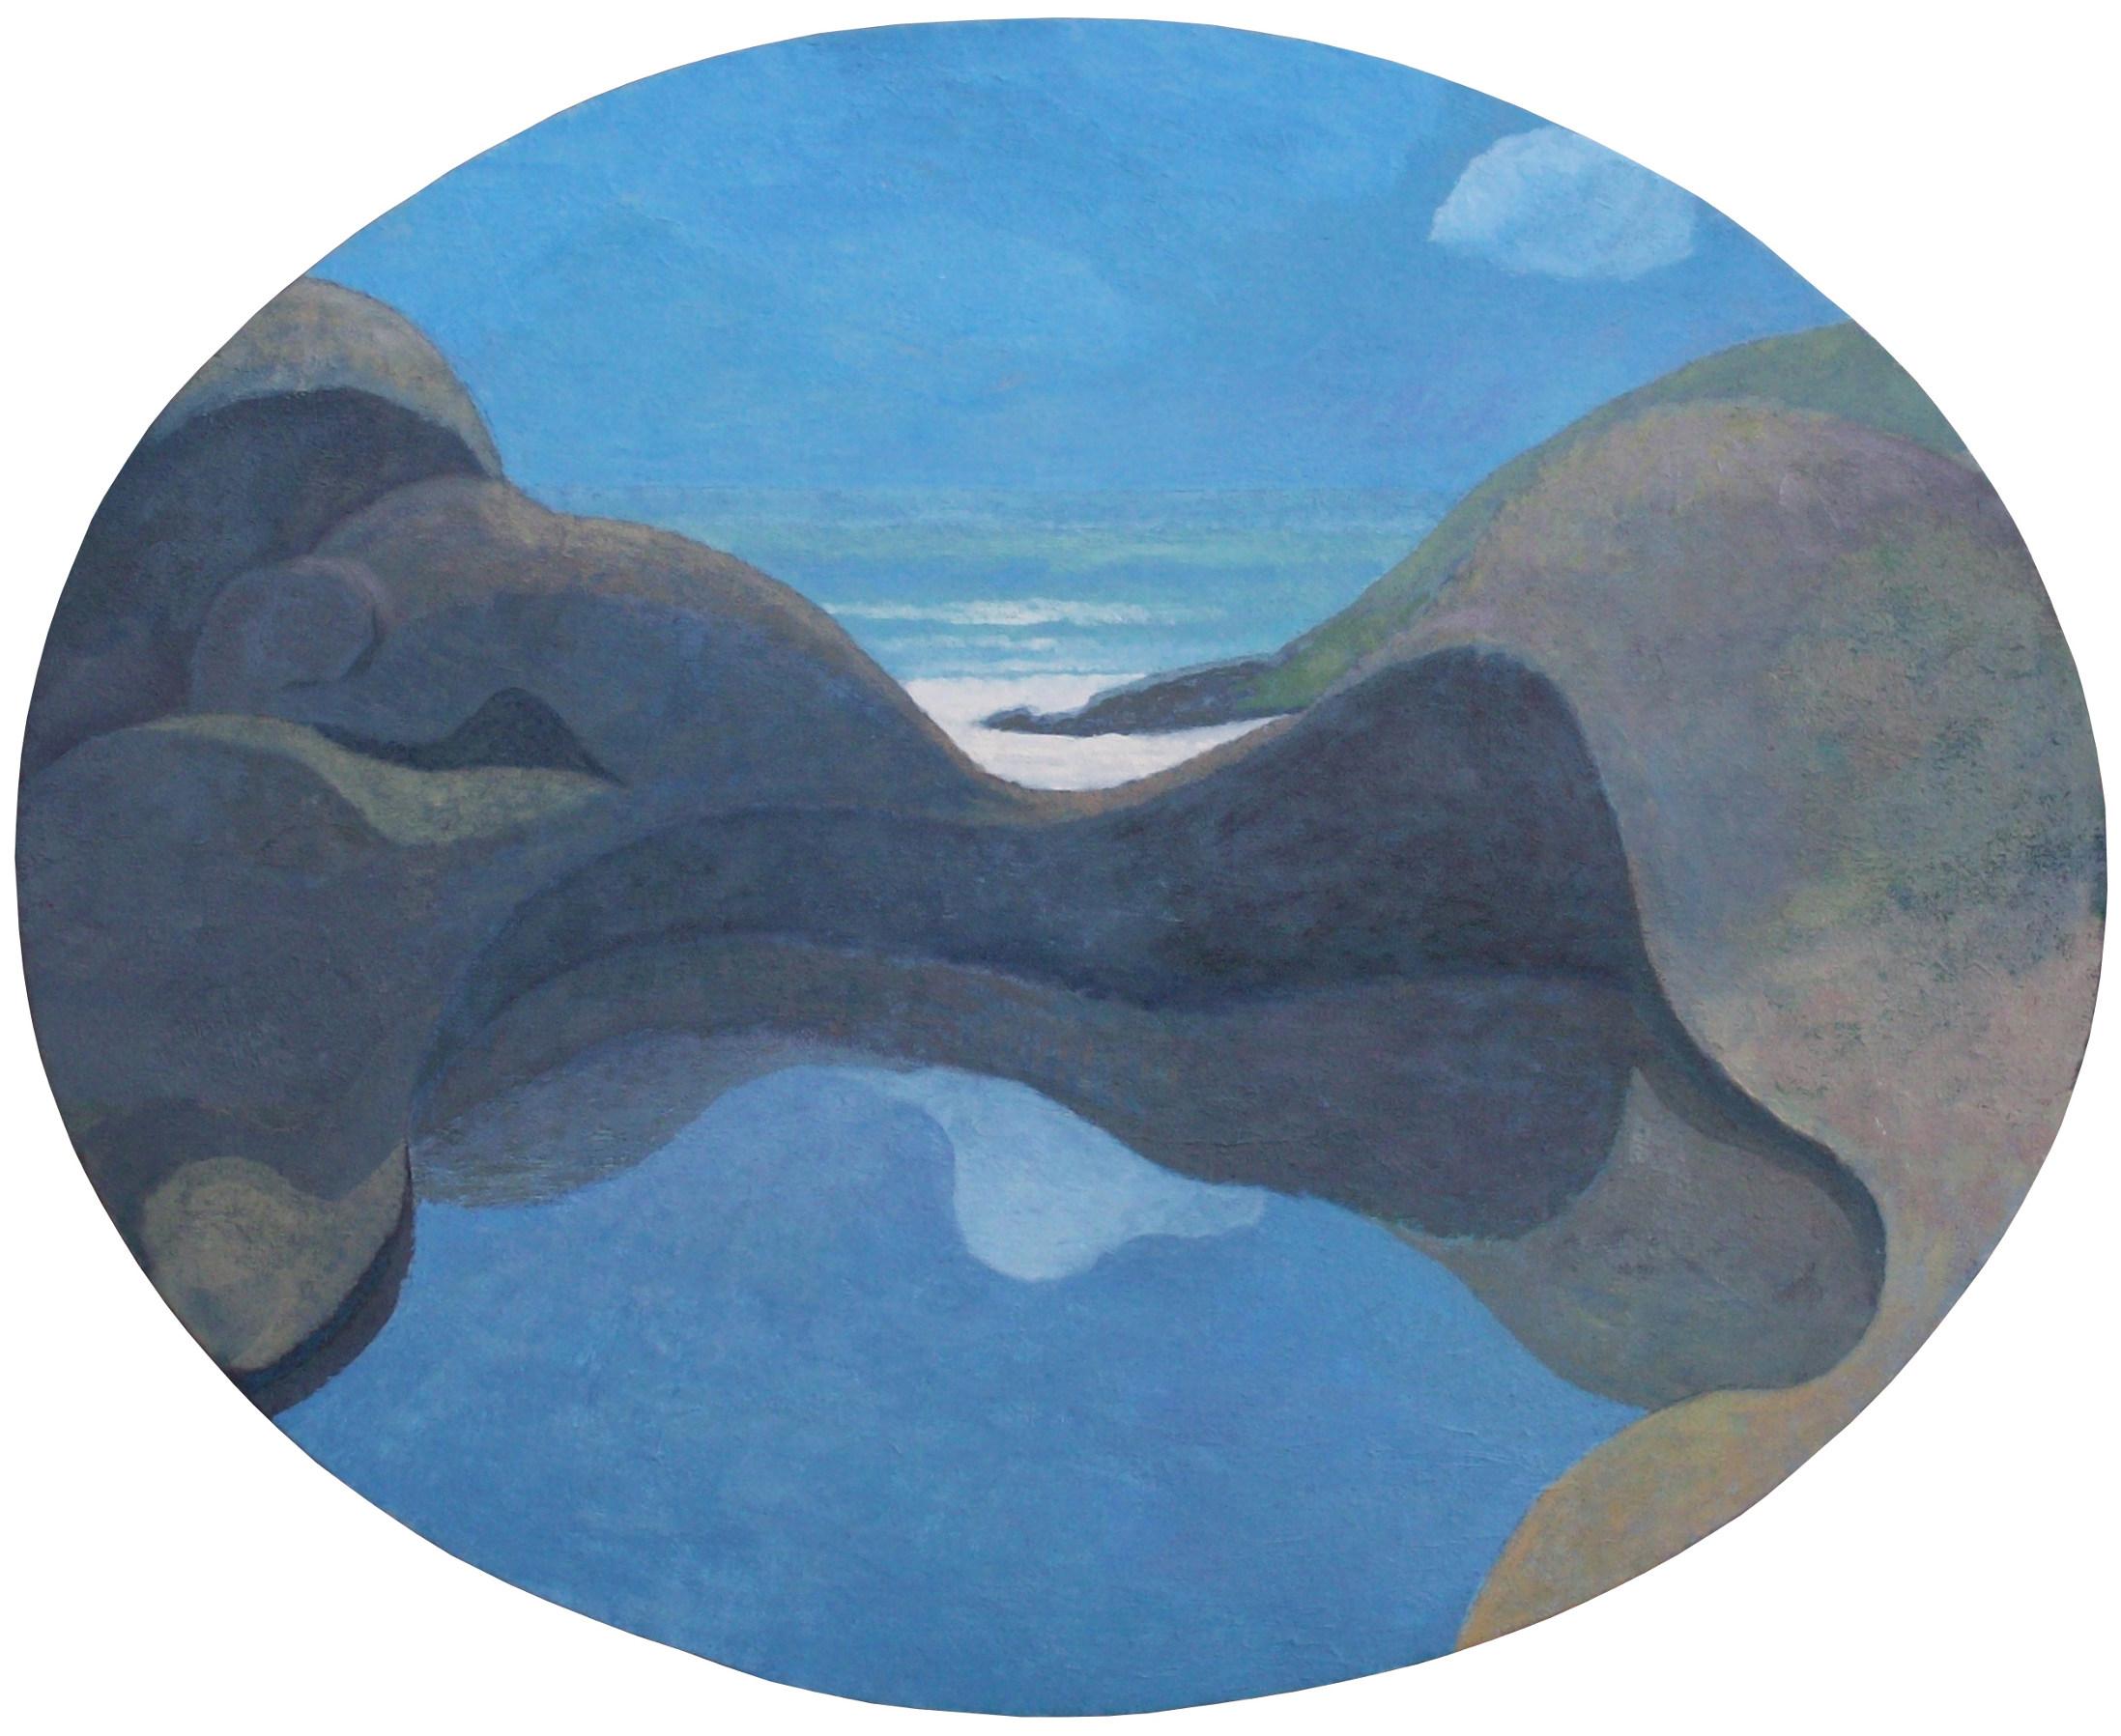 Rock Pool 3